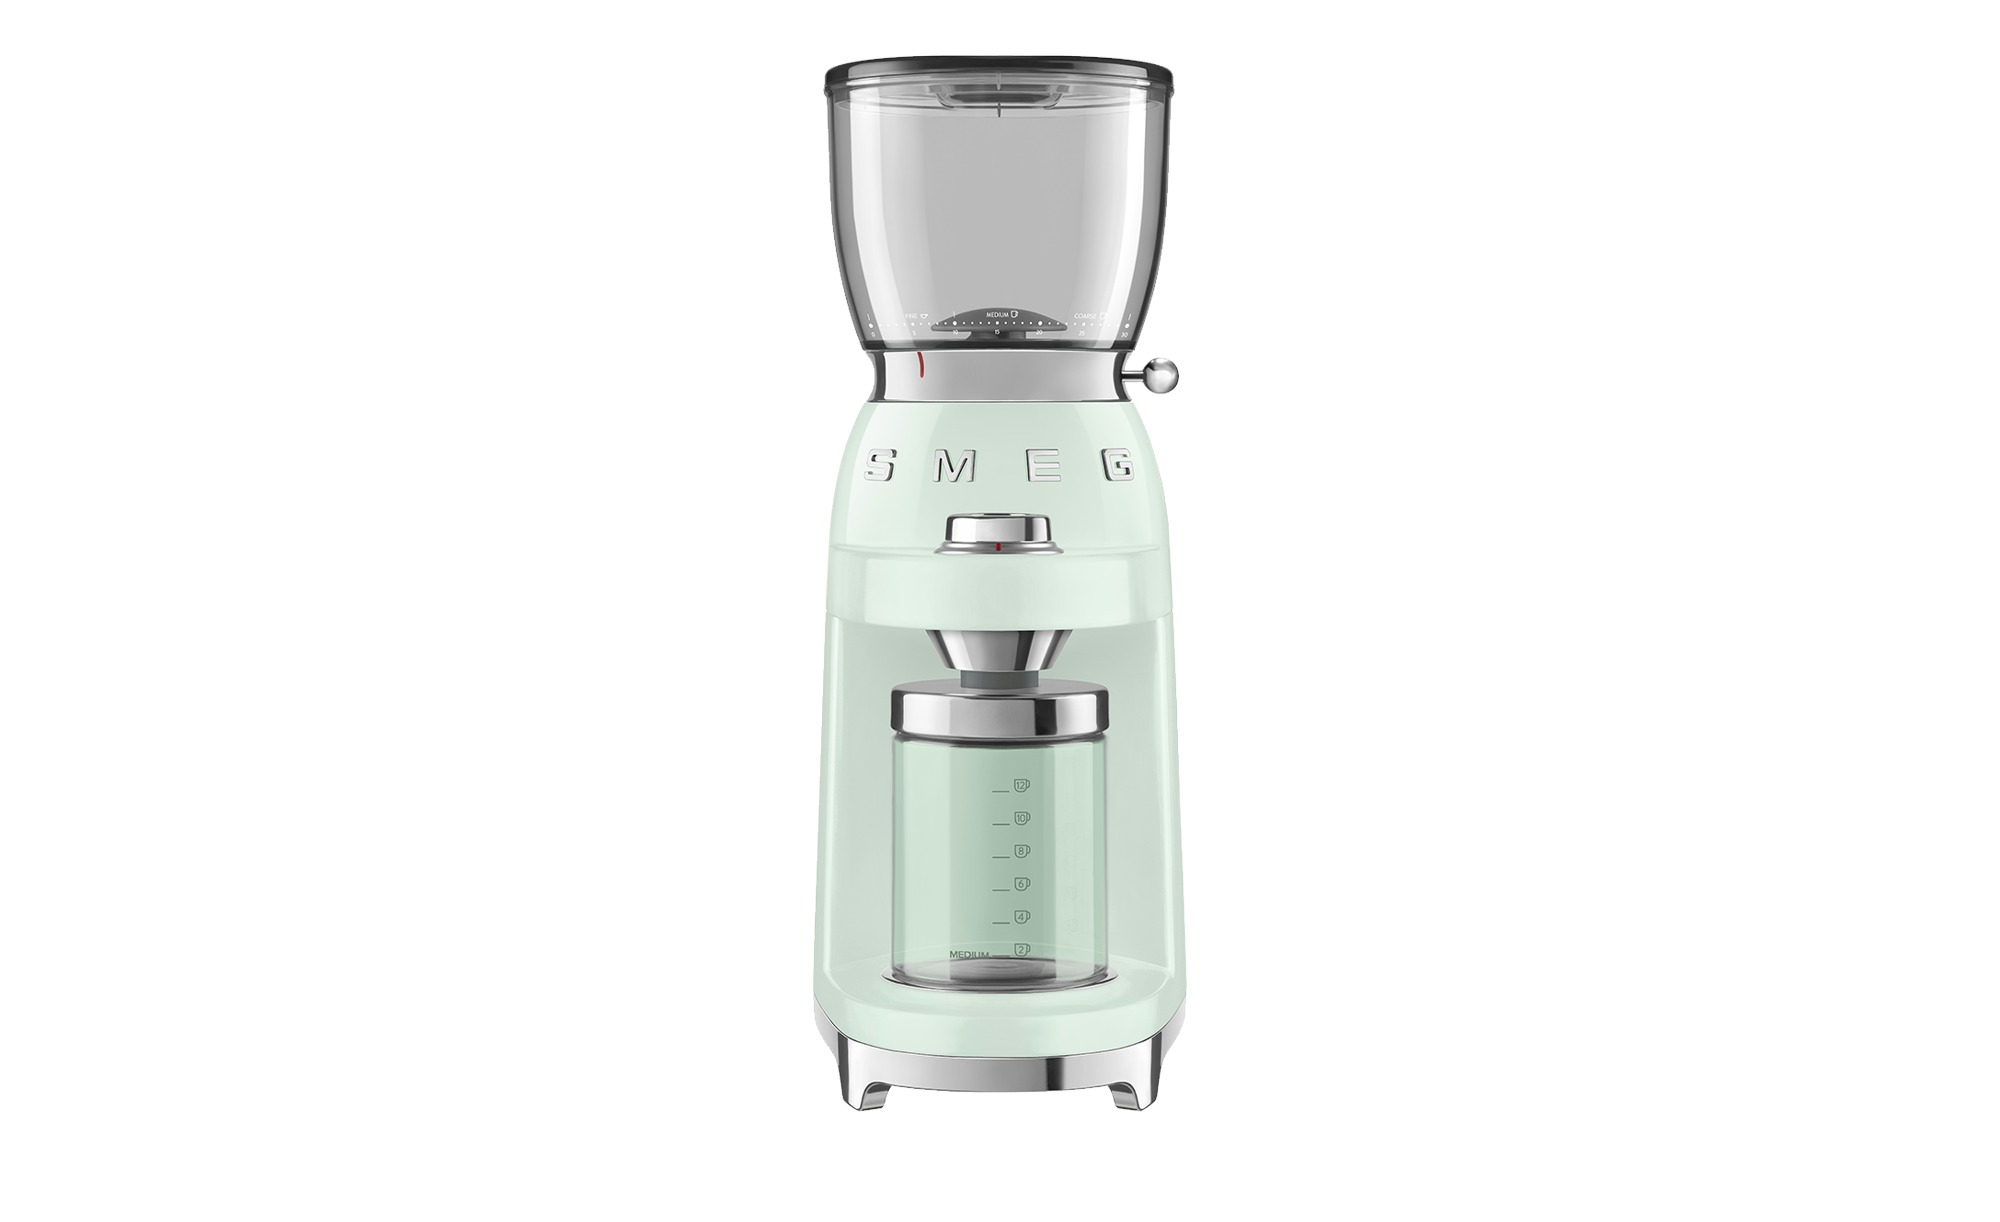 smeg Kaffeemühle  CGF01PGEU - grün - Kunststoff, Aluminium - 25 cm - 46 cm - 17 cm - Elektrokleingeräte > Kaffee & Espressomaschinen - Möbel Kraft | Küche und Esszimmer > Kaffee und Tee > Espressomaschinen | smeg